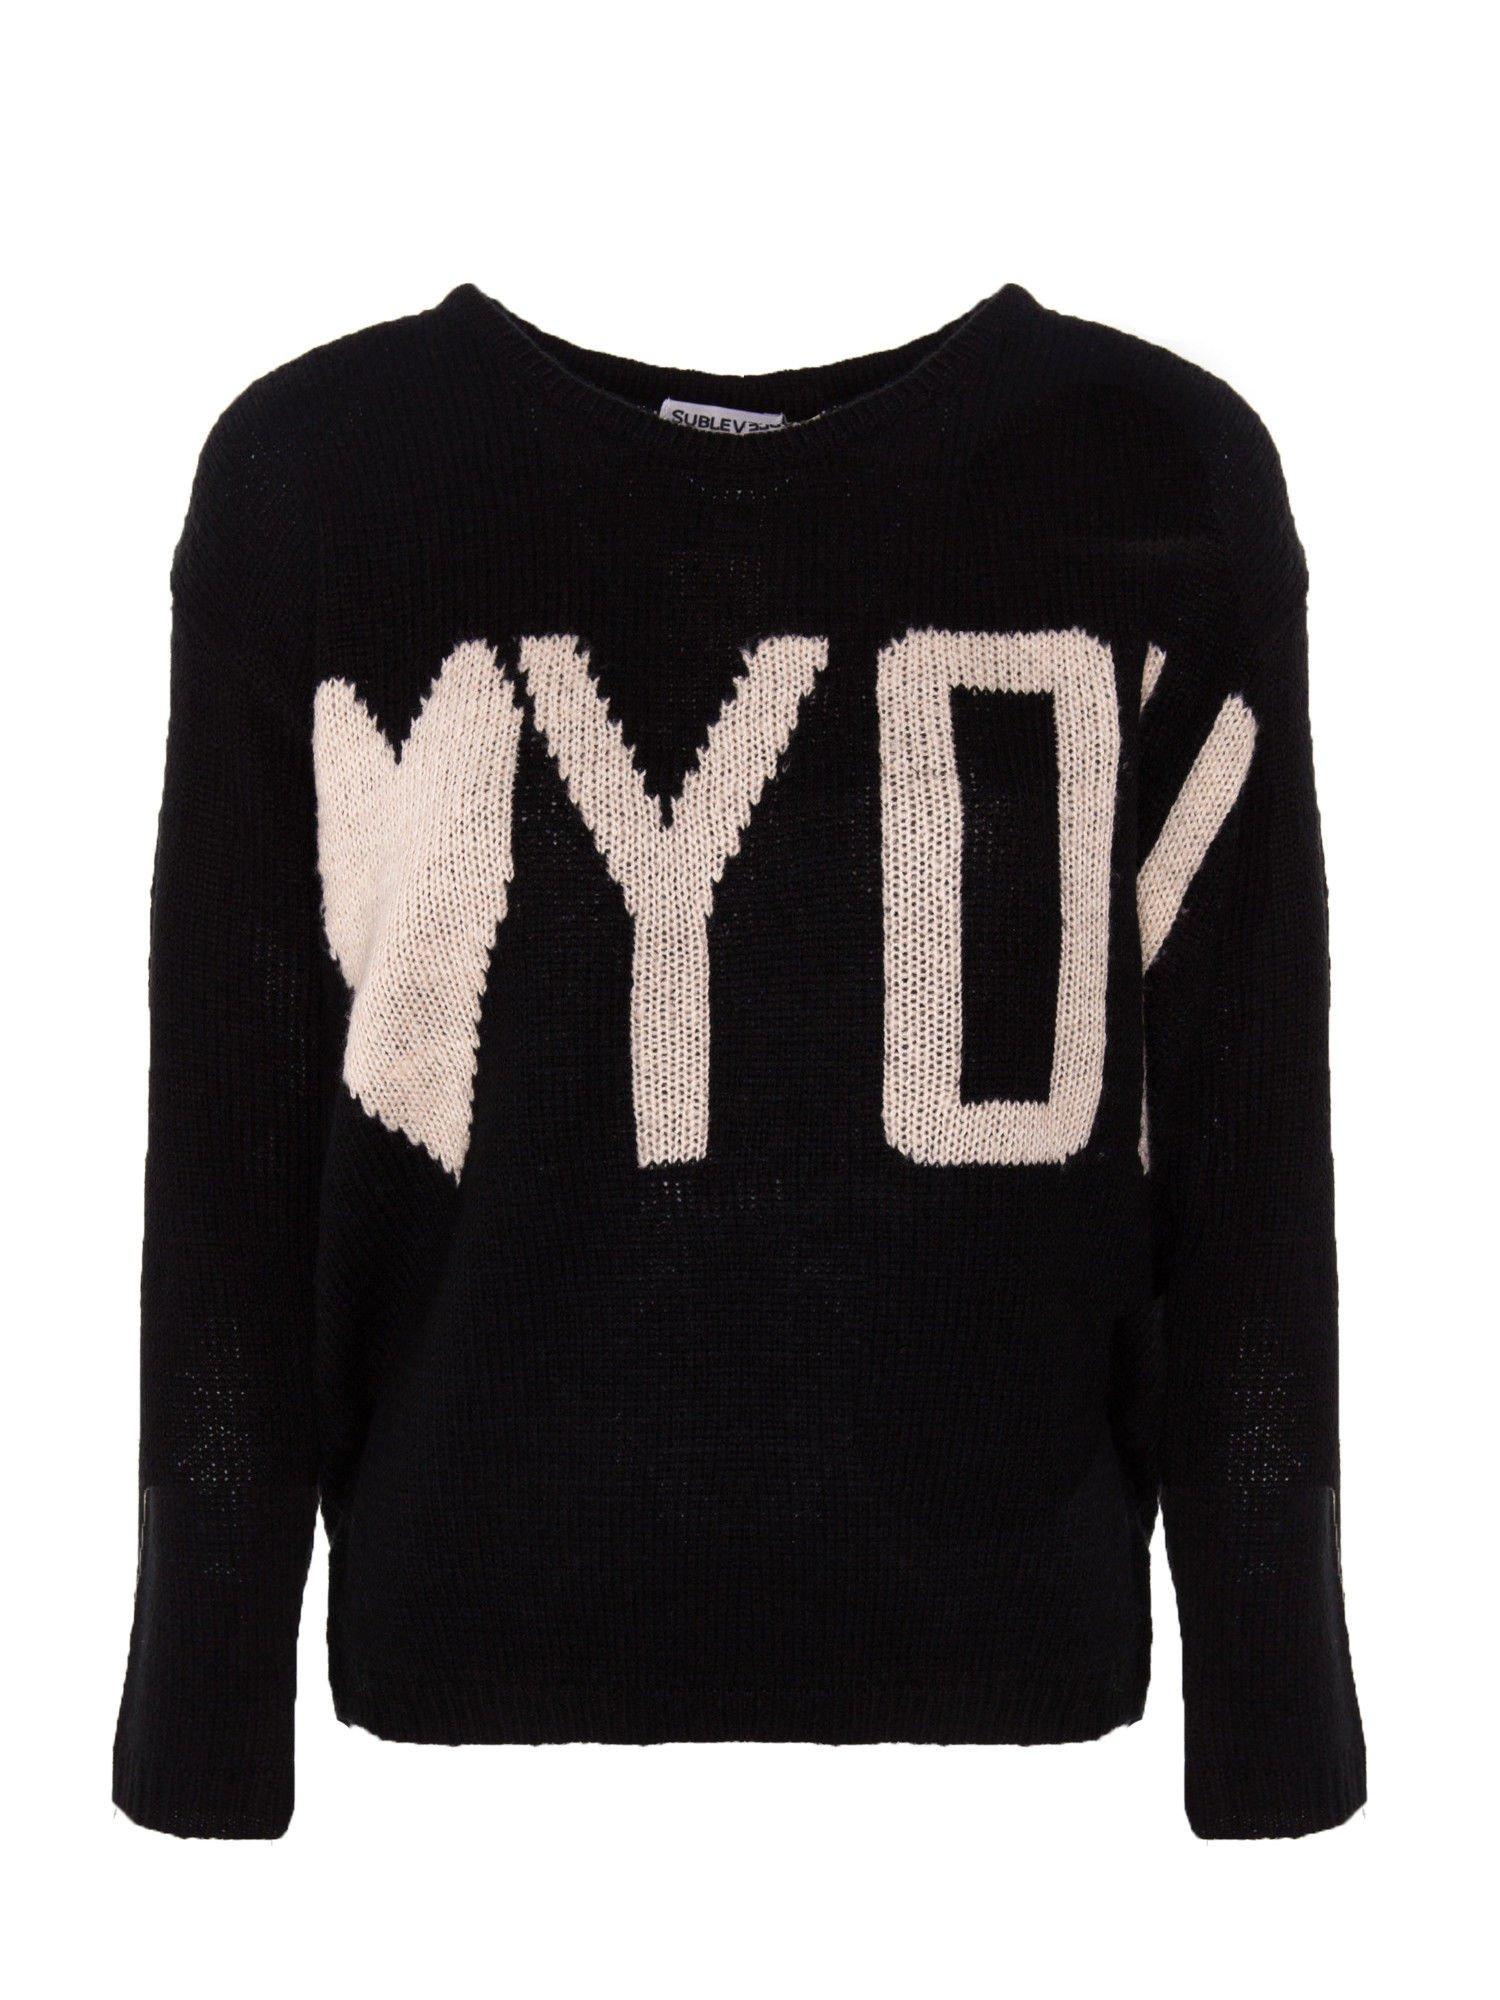 Czarny sweter z sercem i napisem YOU                                  zdj.                                  1